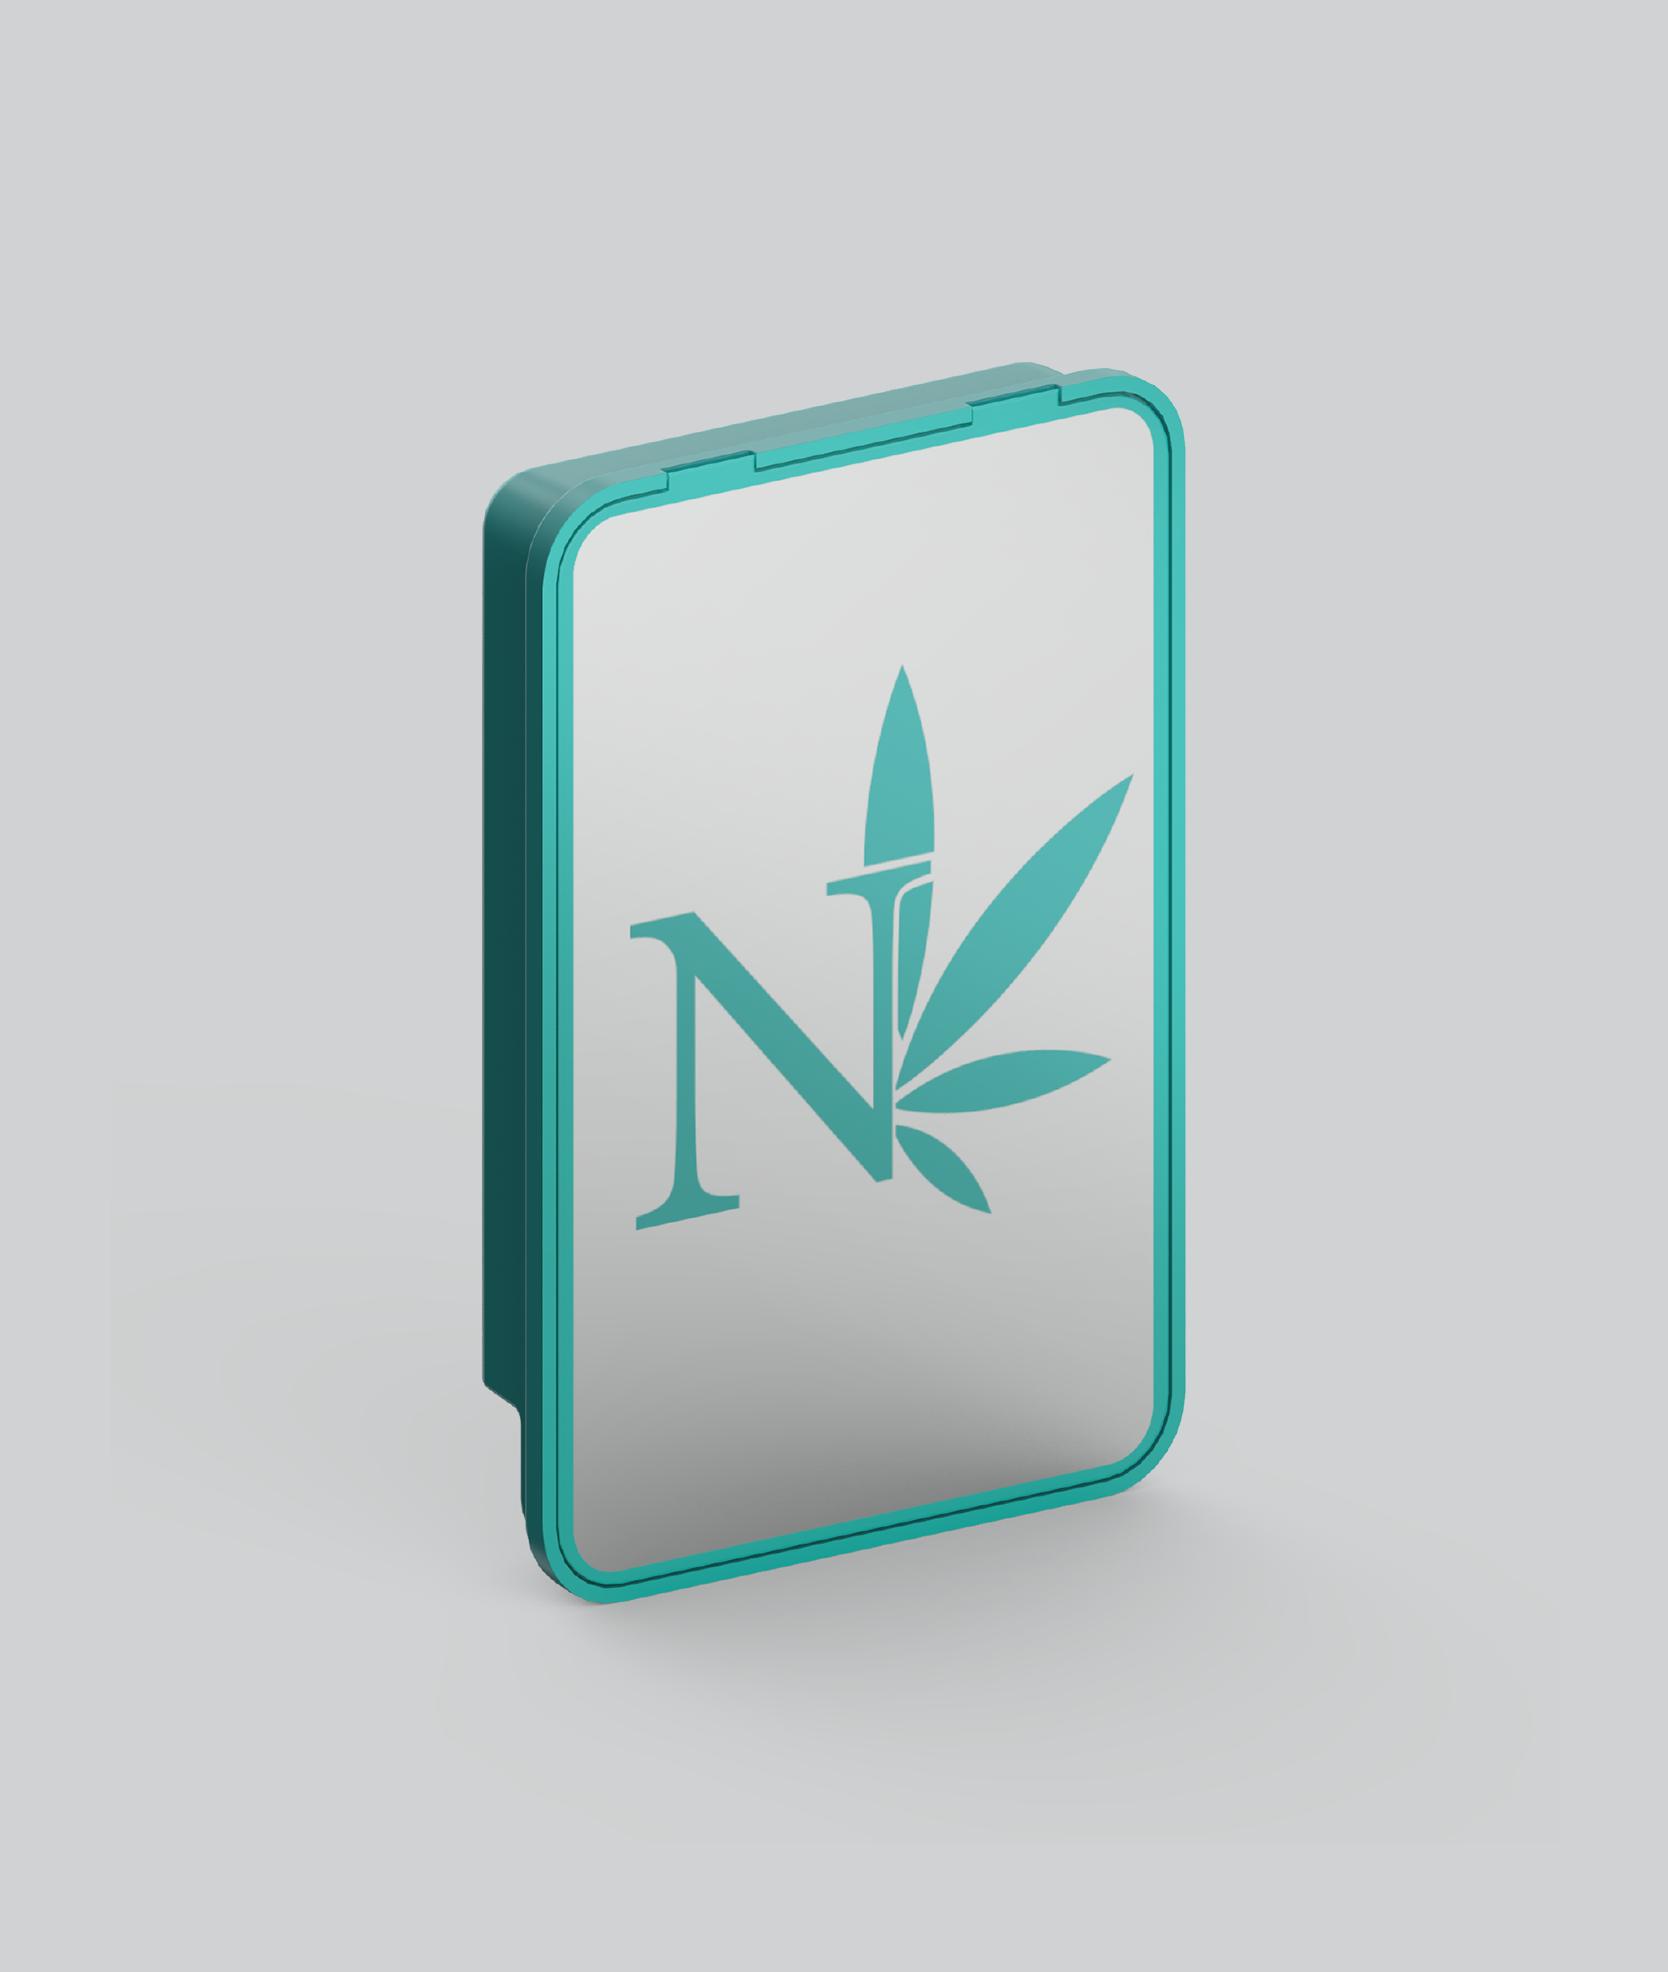 nleaf-snaptech-case-custom-cartridge-packaging